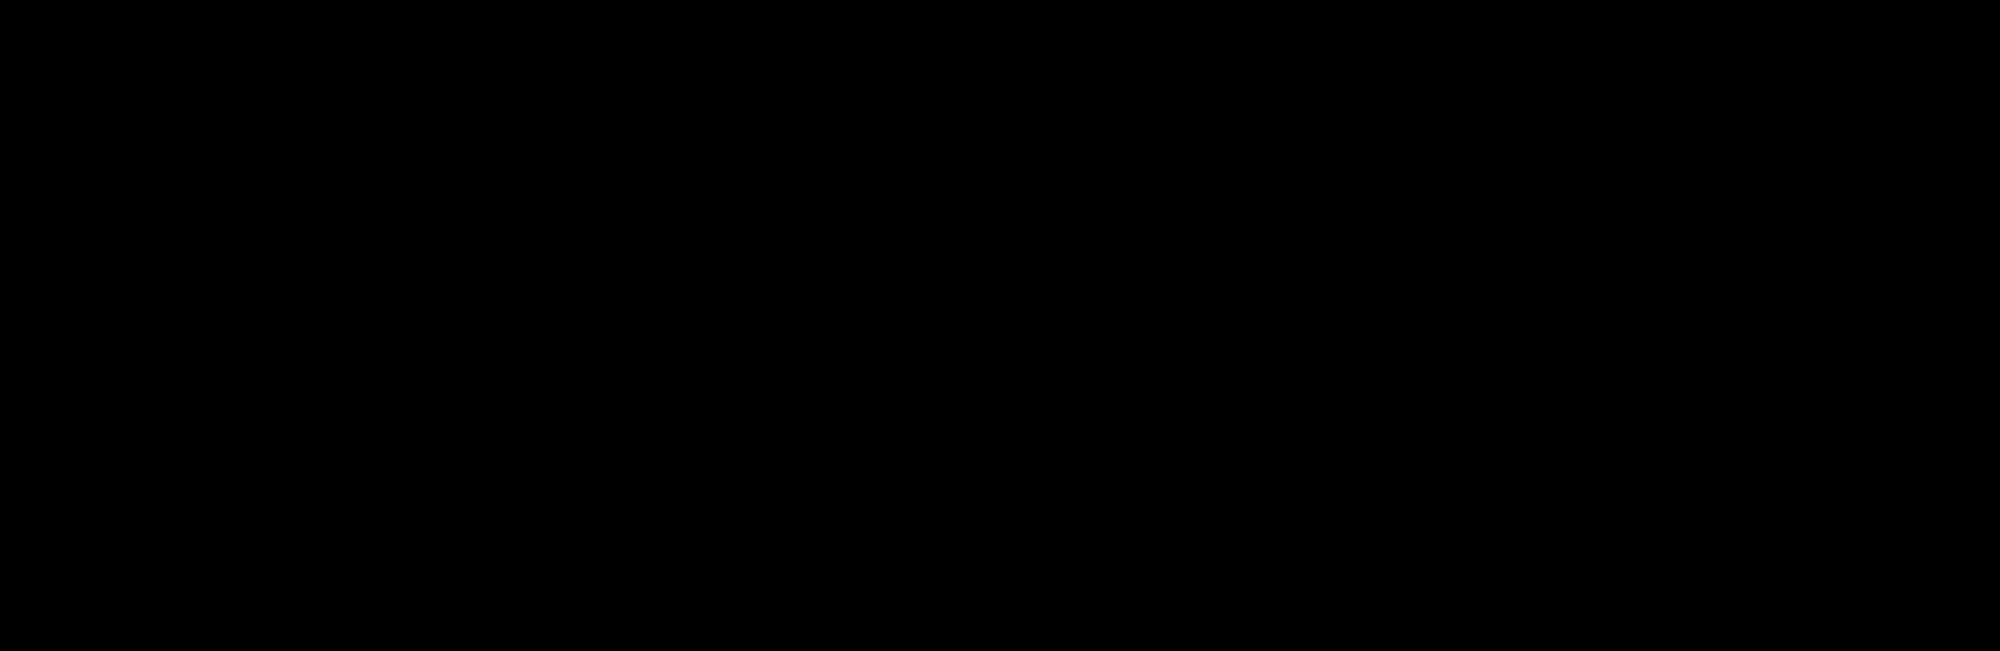 SweetSimplyJenny-logo.png